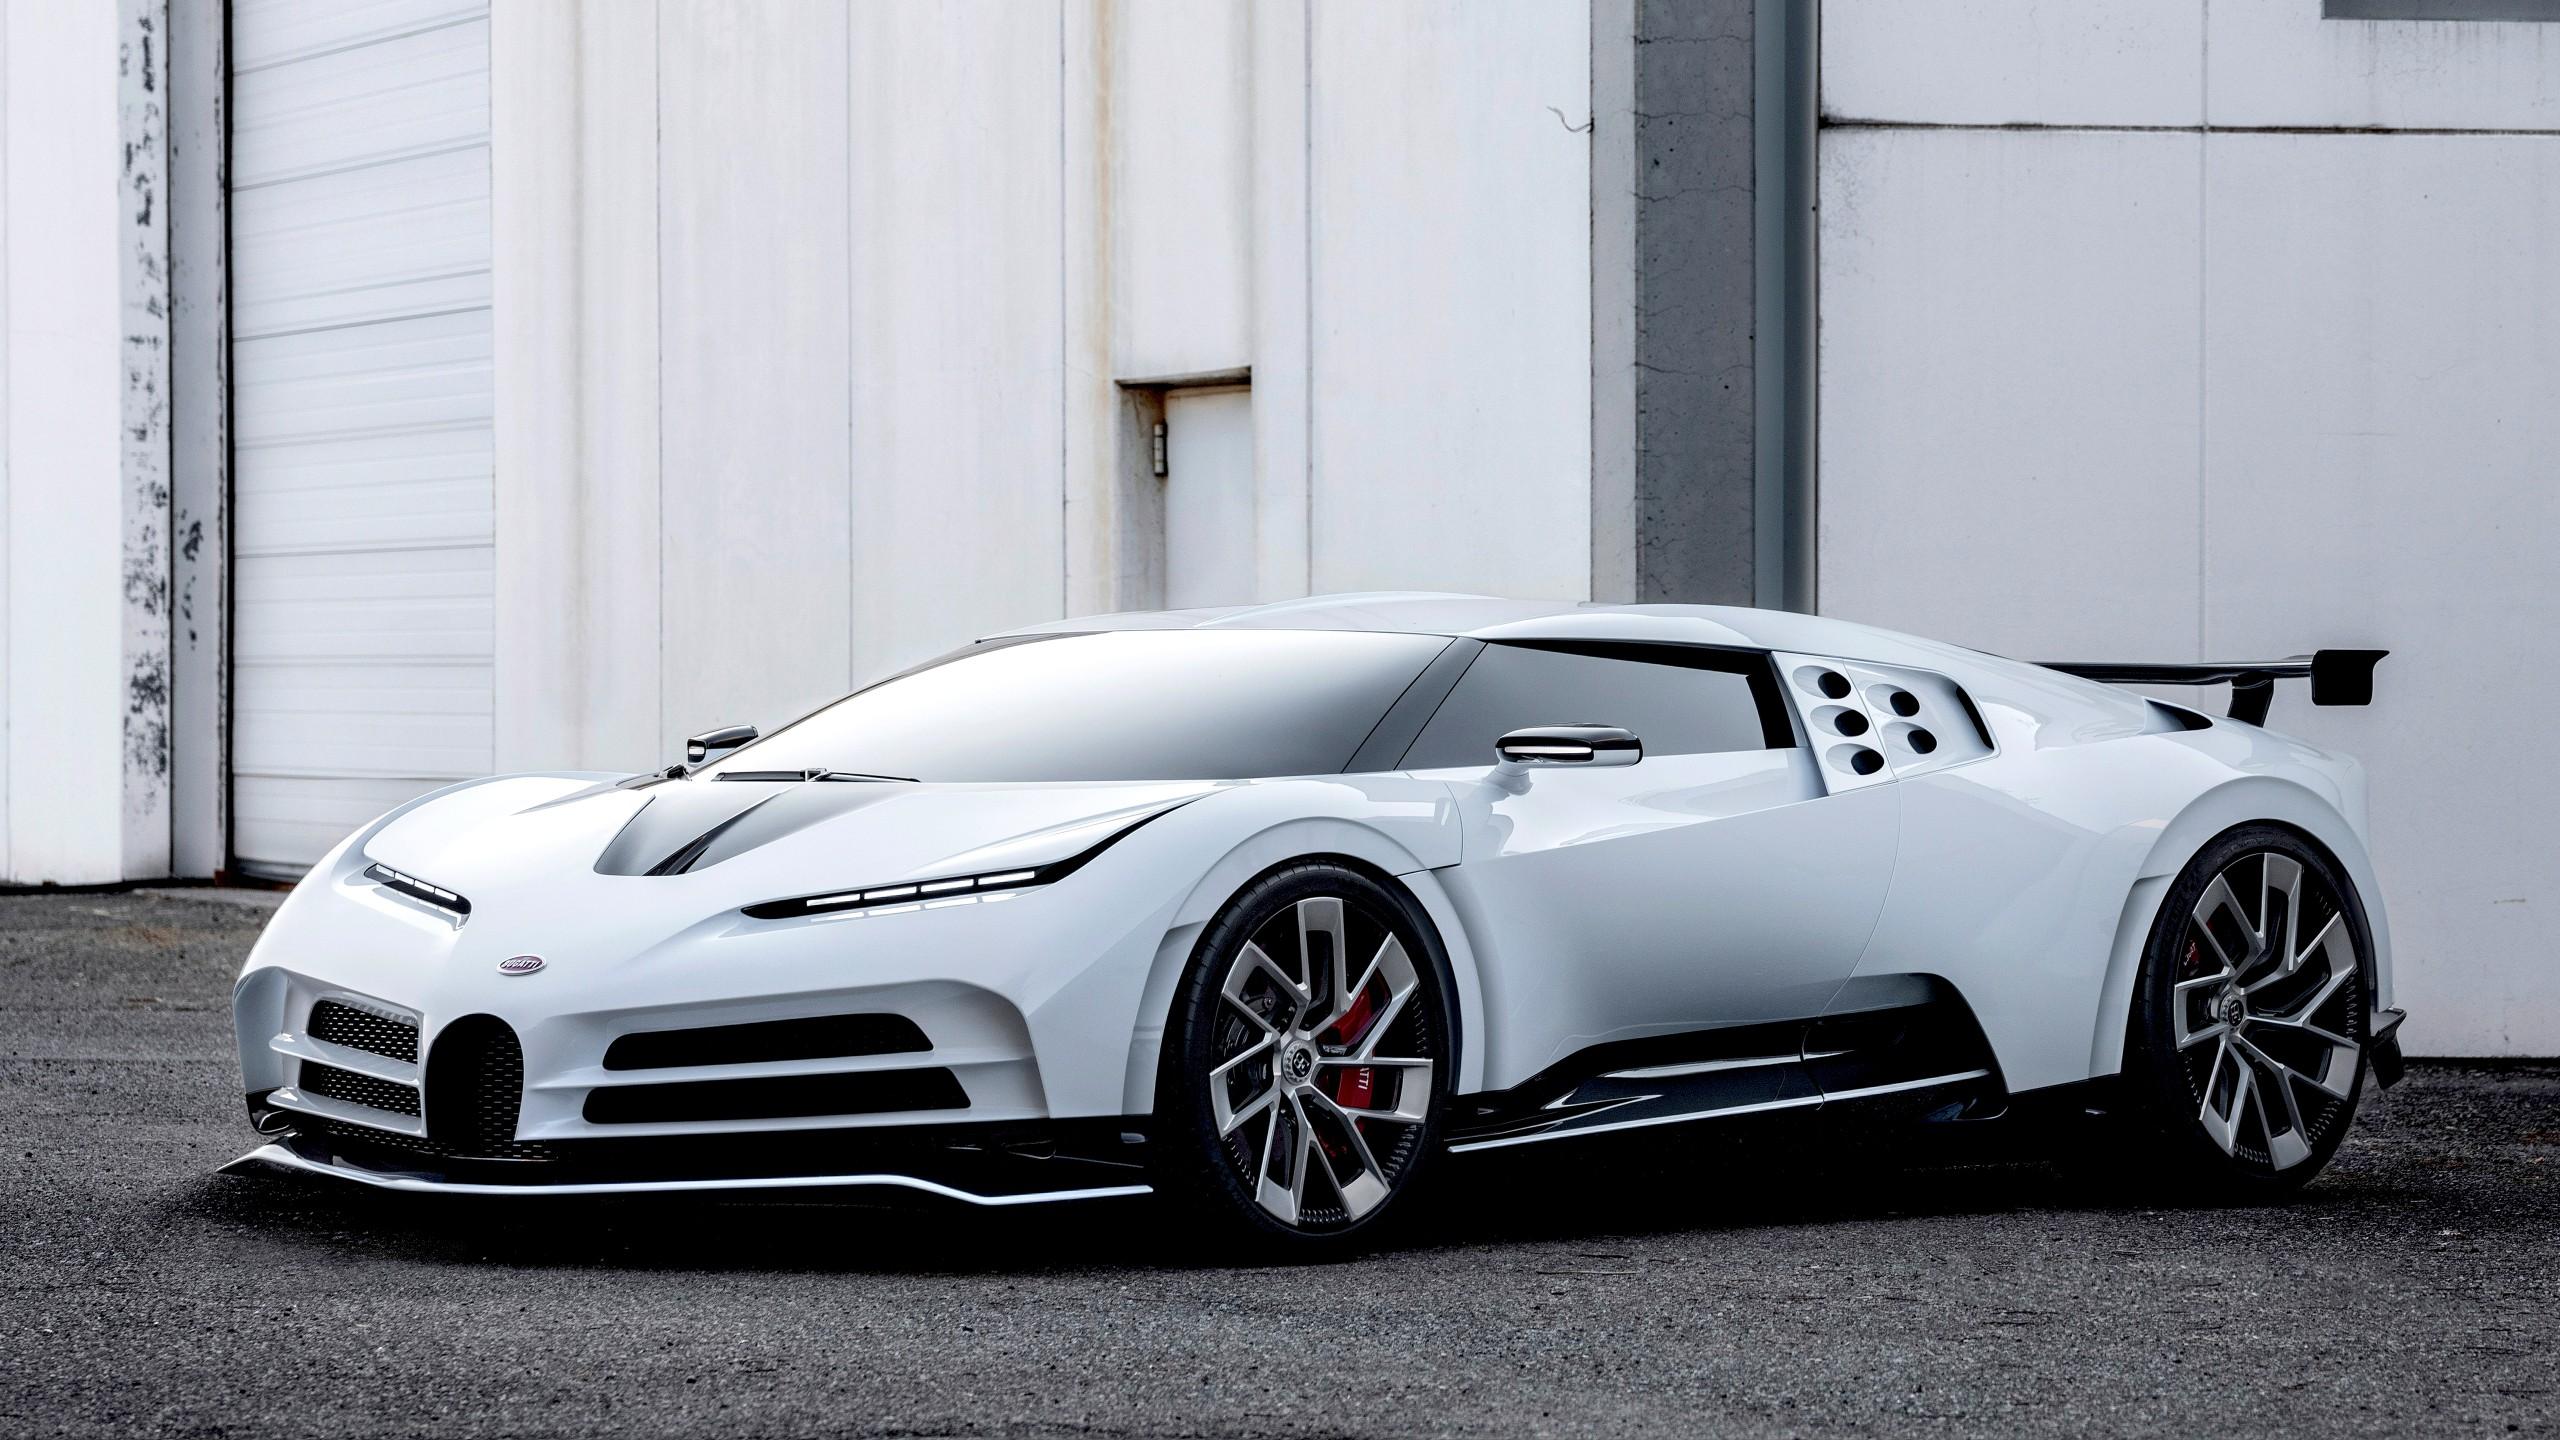 Ferrari Iphone 6 Wallpaper Bugatti Centodieci 2019 5k 7 Wallpaper Hd Car Wallpapers